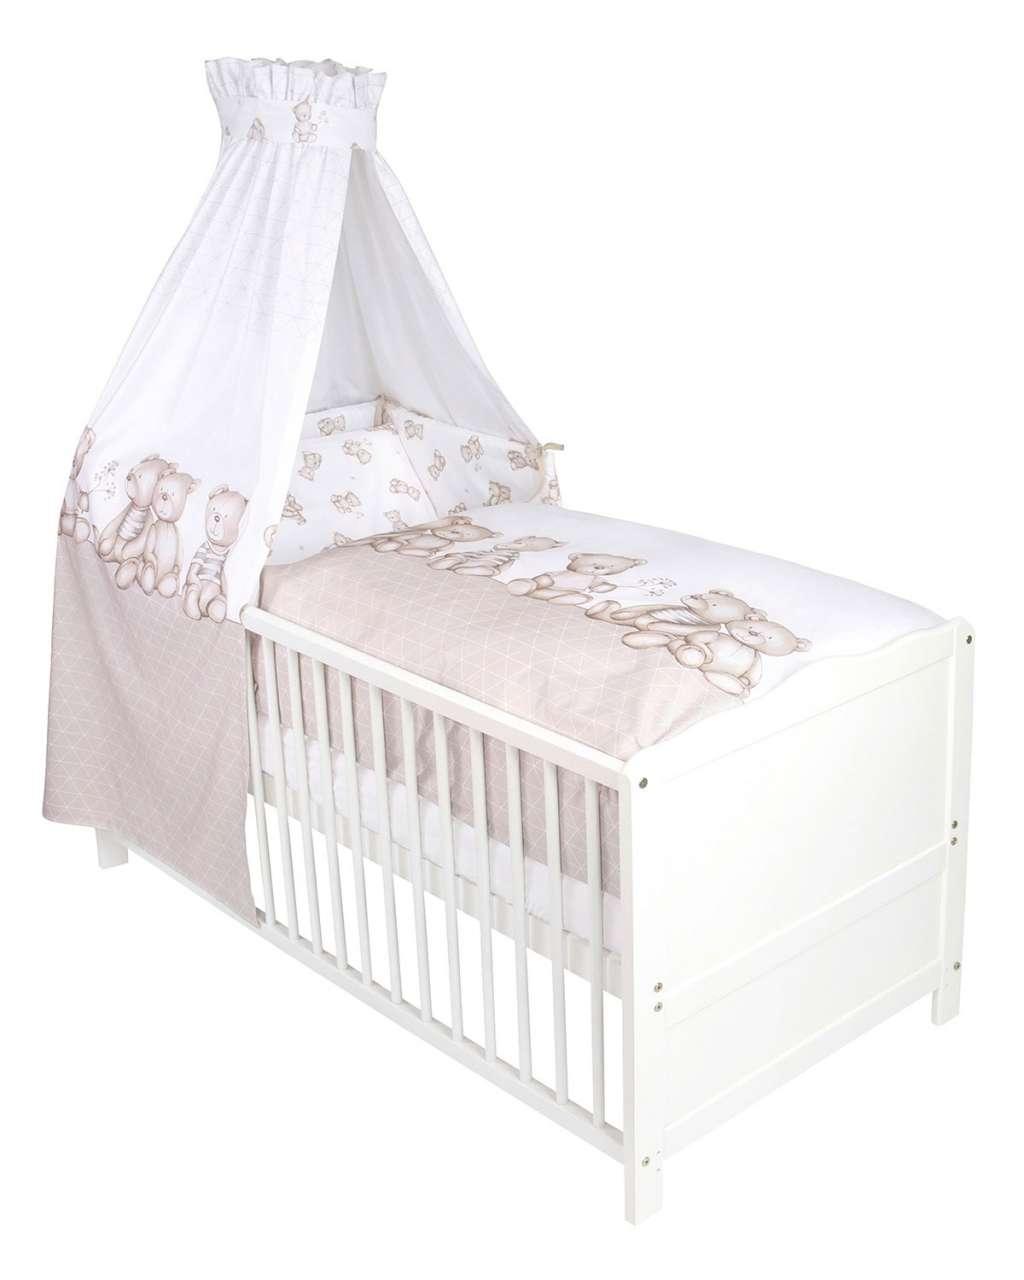 moebel-jack.de Baby-Betten-Set 3-tlg. BÄRENLAND 1, 100x135 cm, Taupe, mit Himmel